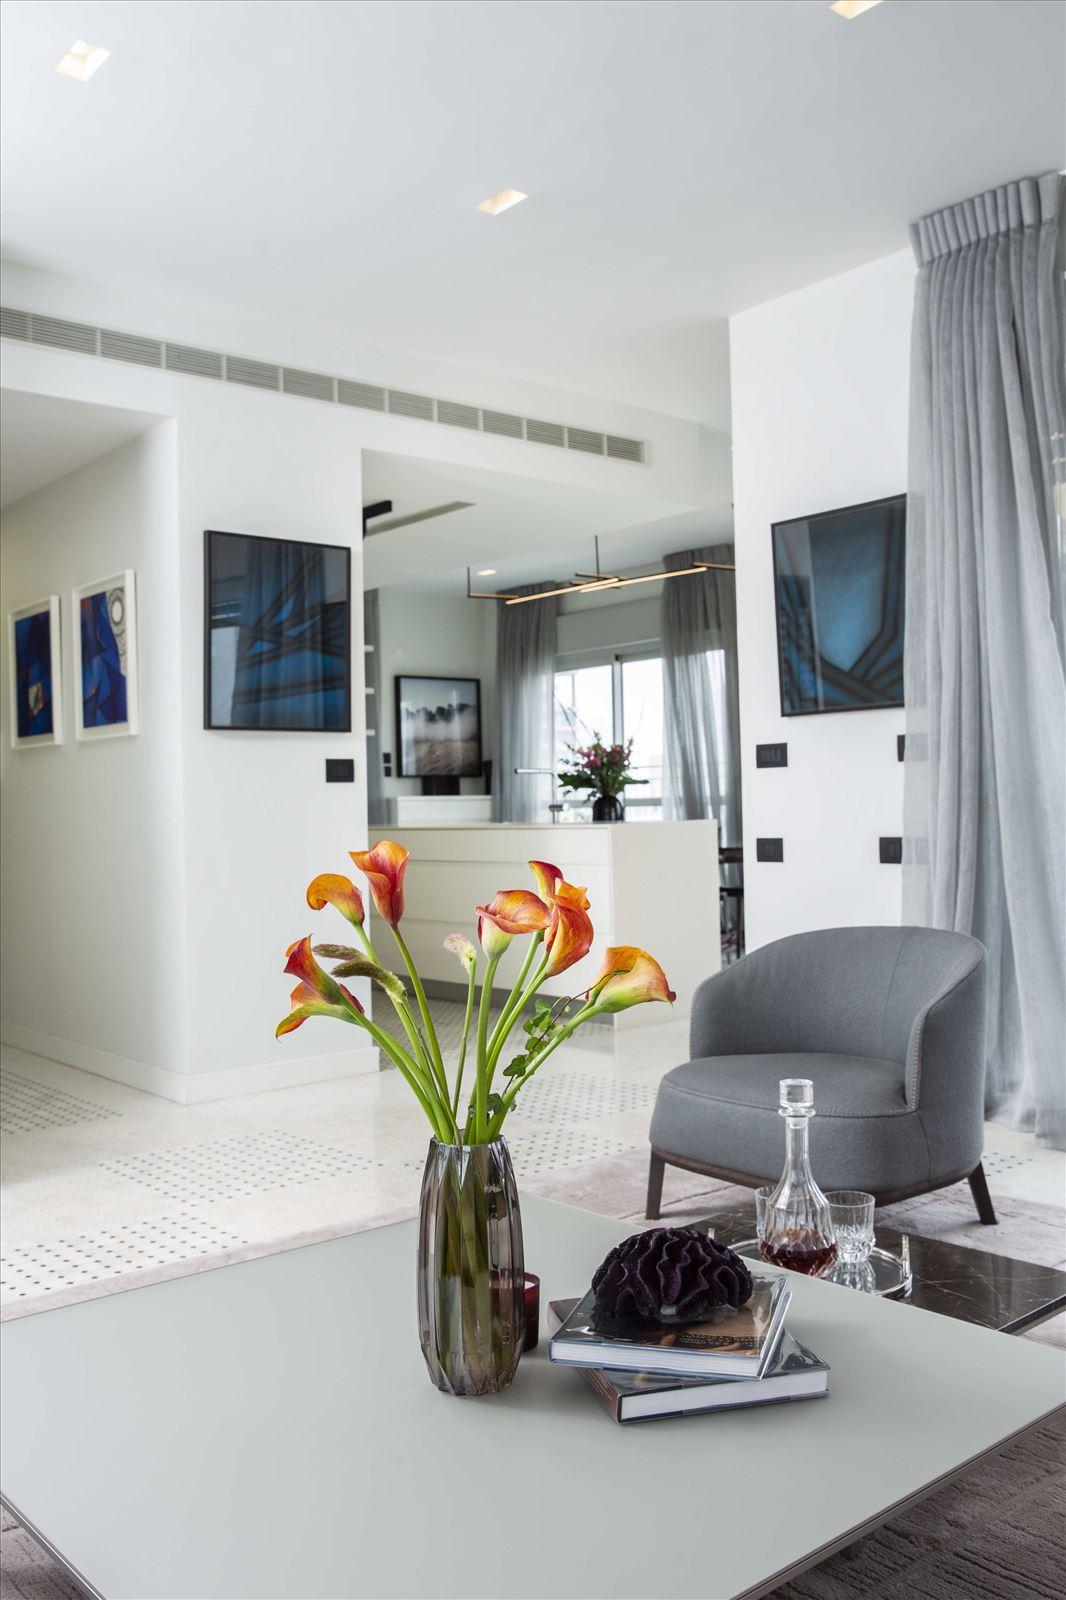 Tel Aviv apartment in Parisian aroma קמחי תאורה - תאורה בחלל הבית